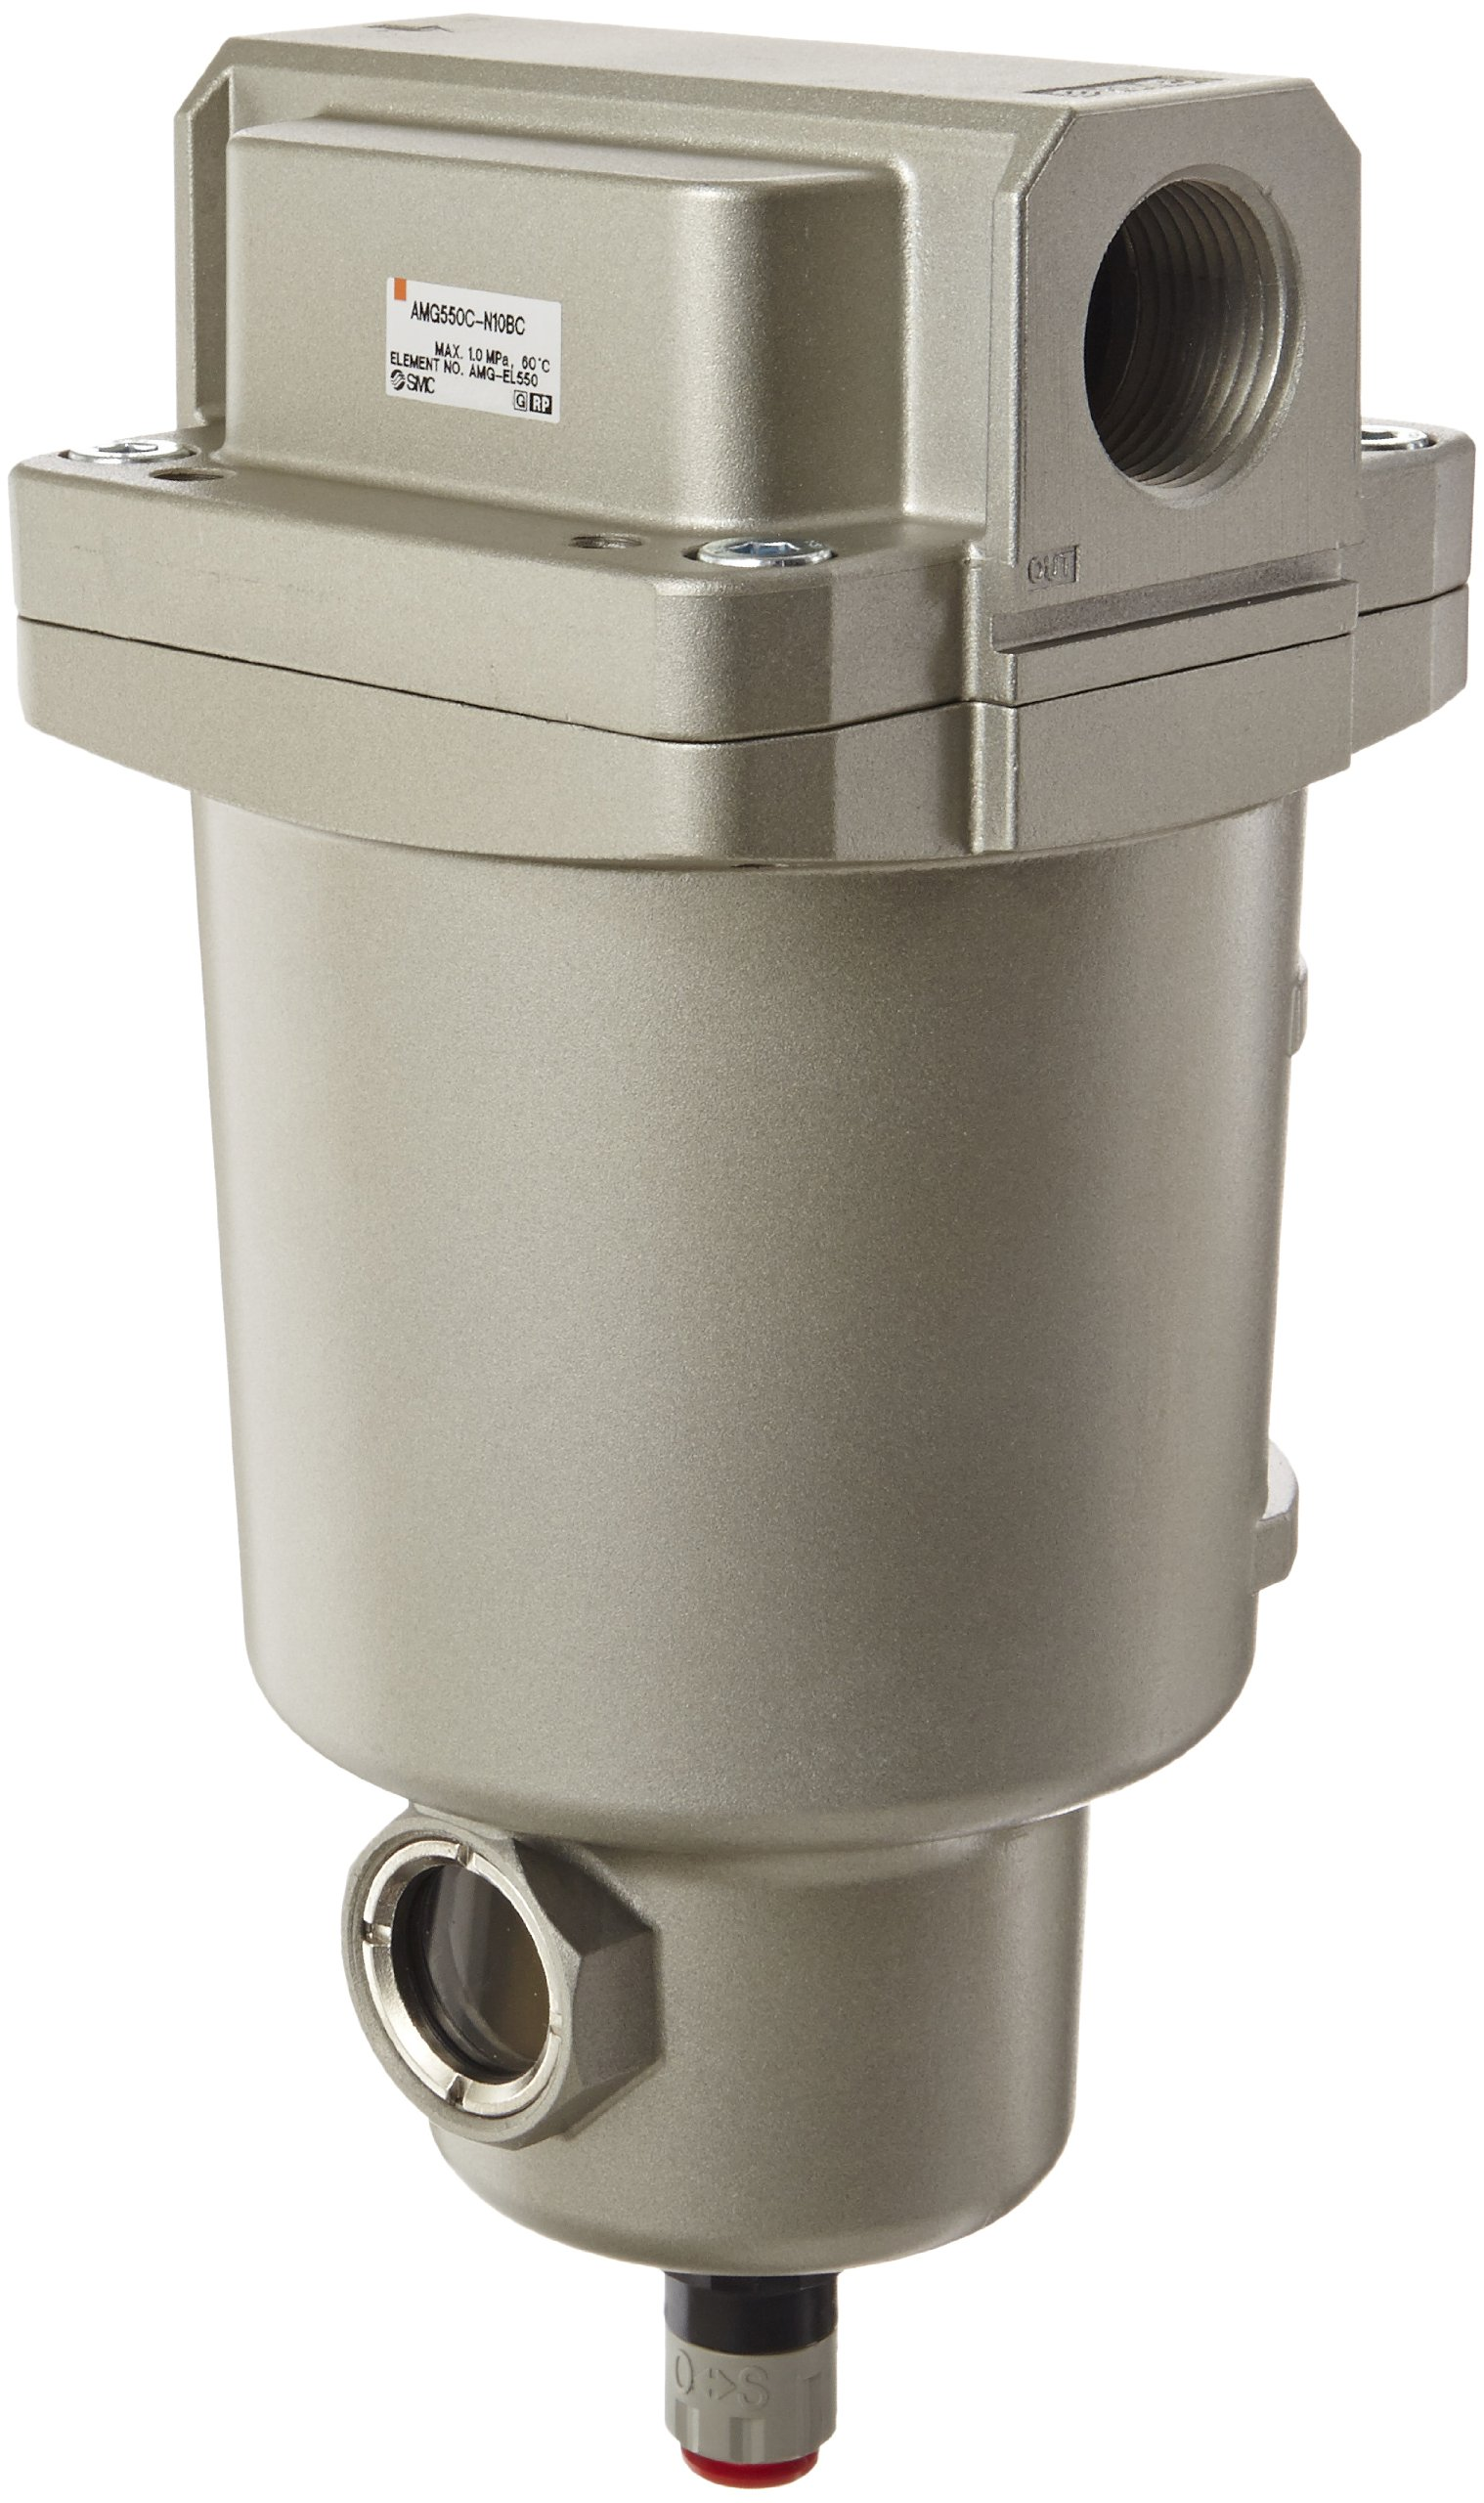 SMC AMG550C-N10BC Water Separator, N.C. Auto Drain, 3,700 L/min, 1'' NPT, Mounting Bracket by SMC